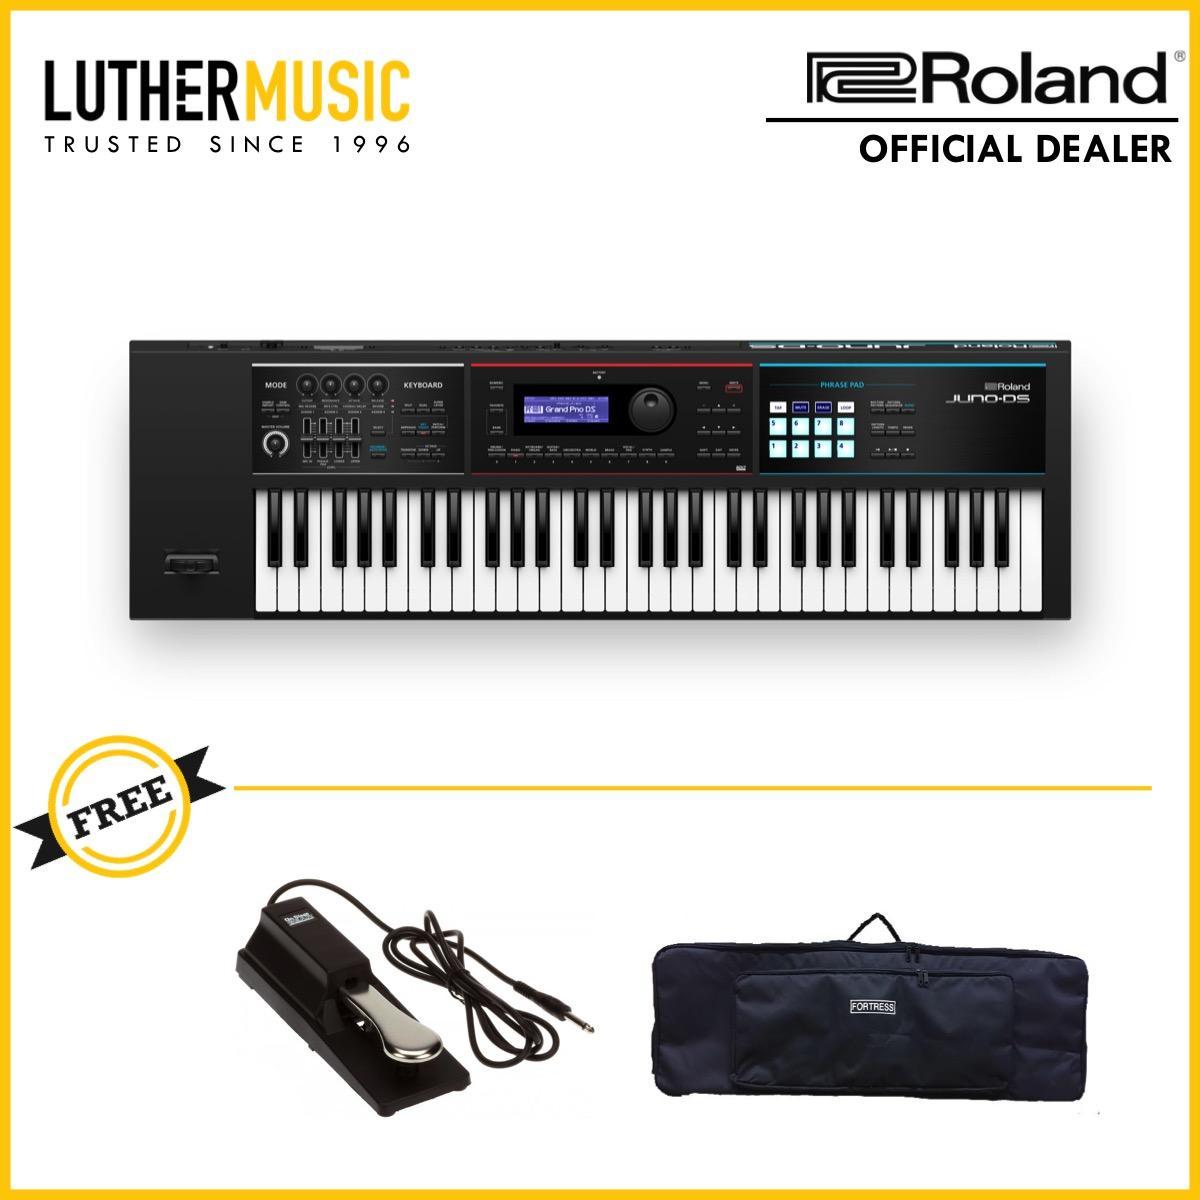 [OFFICIAL DEALER] Roland JUNO DS61 61 Key Synthesizer Keyboard Bundle